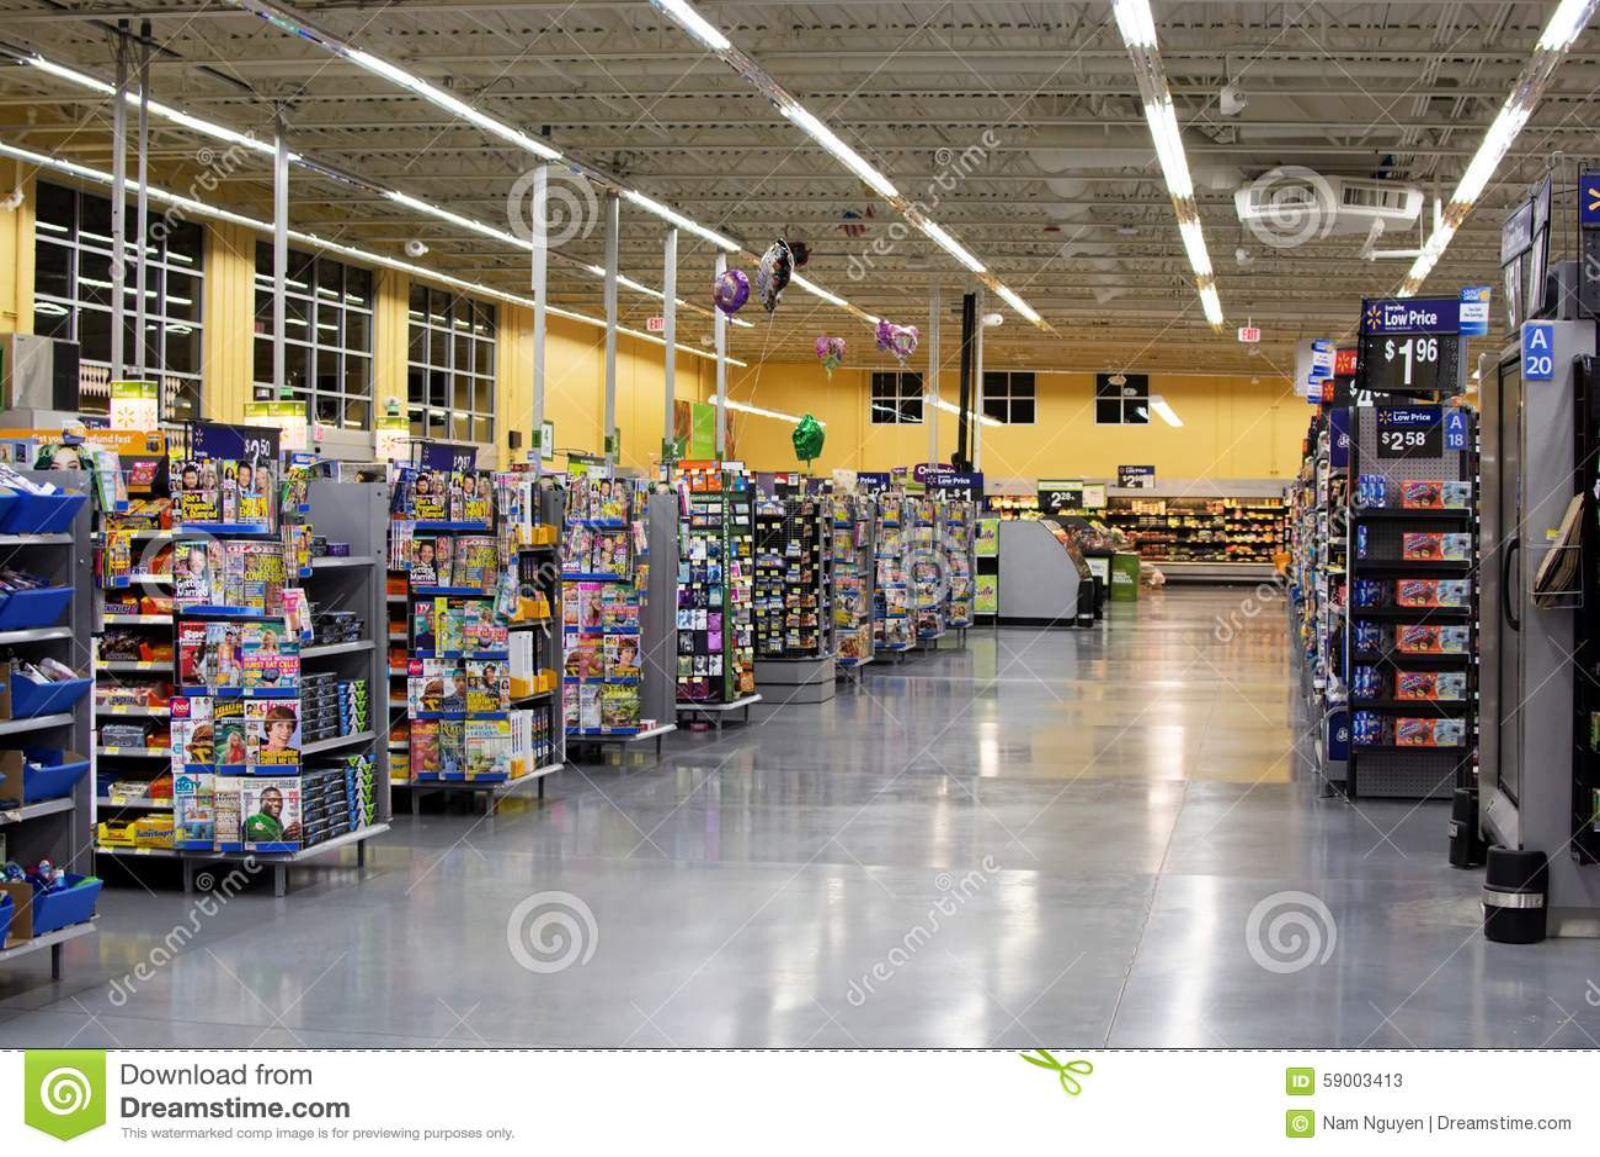 Company Walmart >> Walmart Retail Company Editorial Stock Photo Image Of Retail 59003413